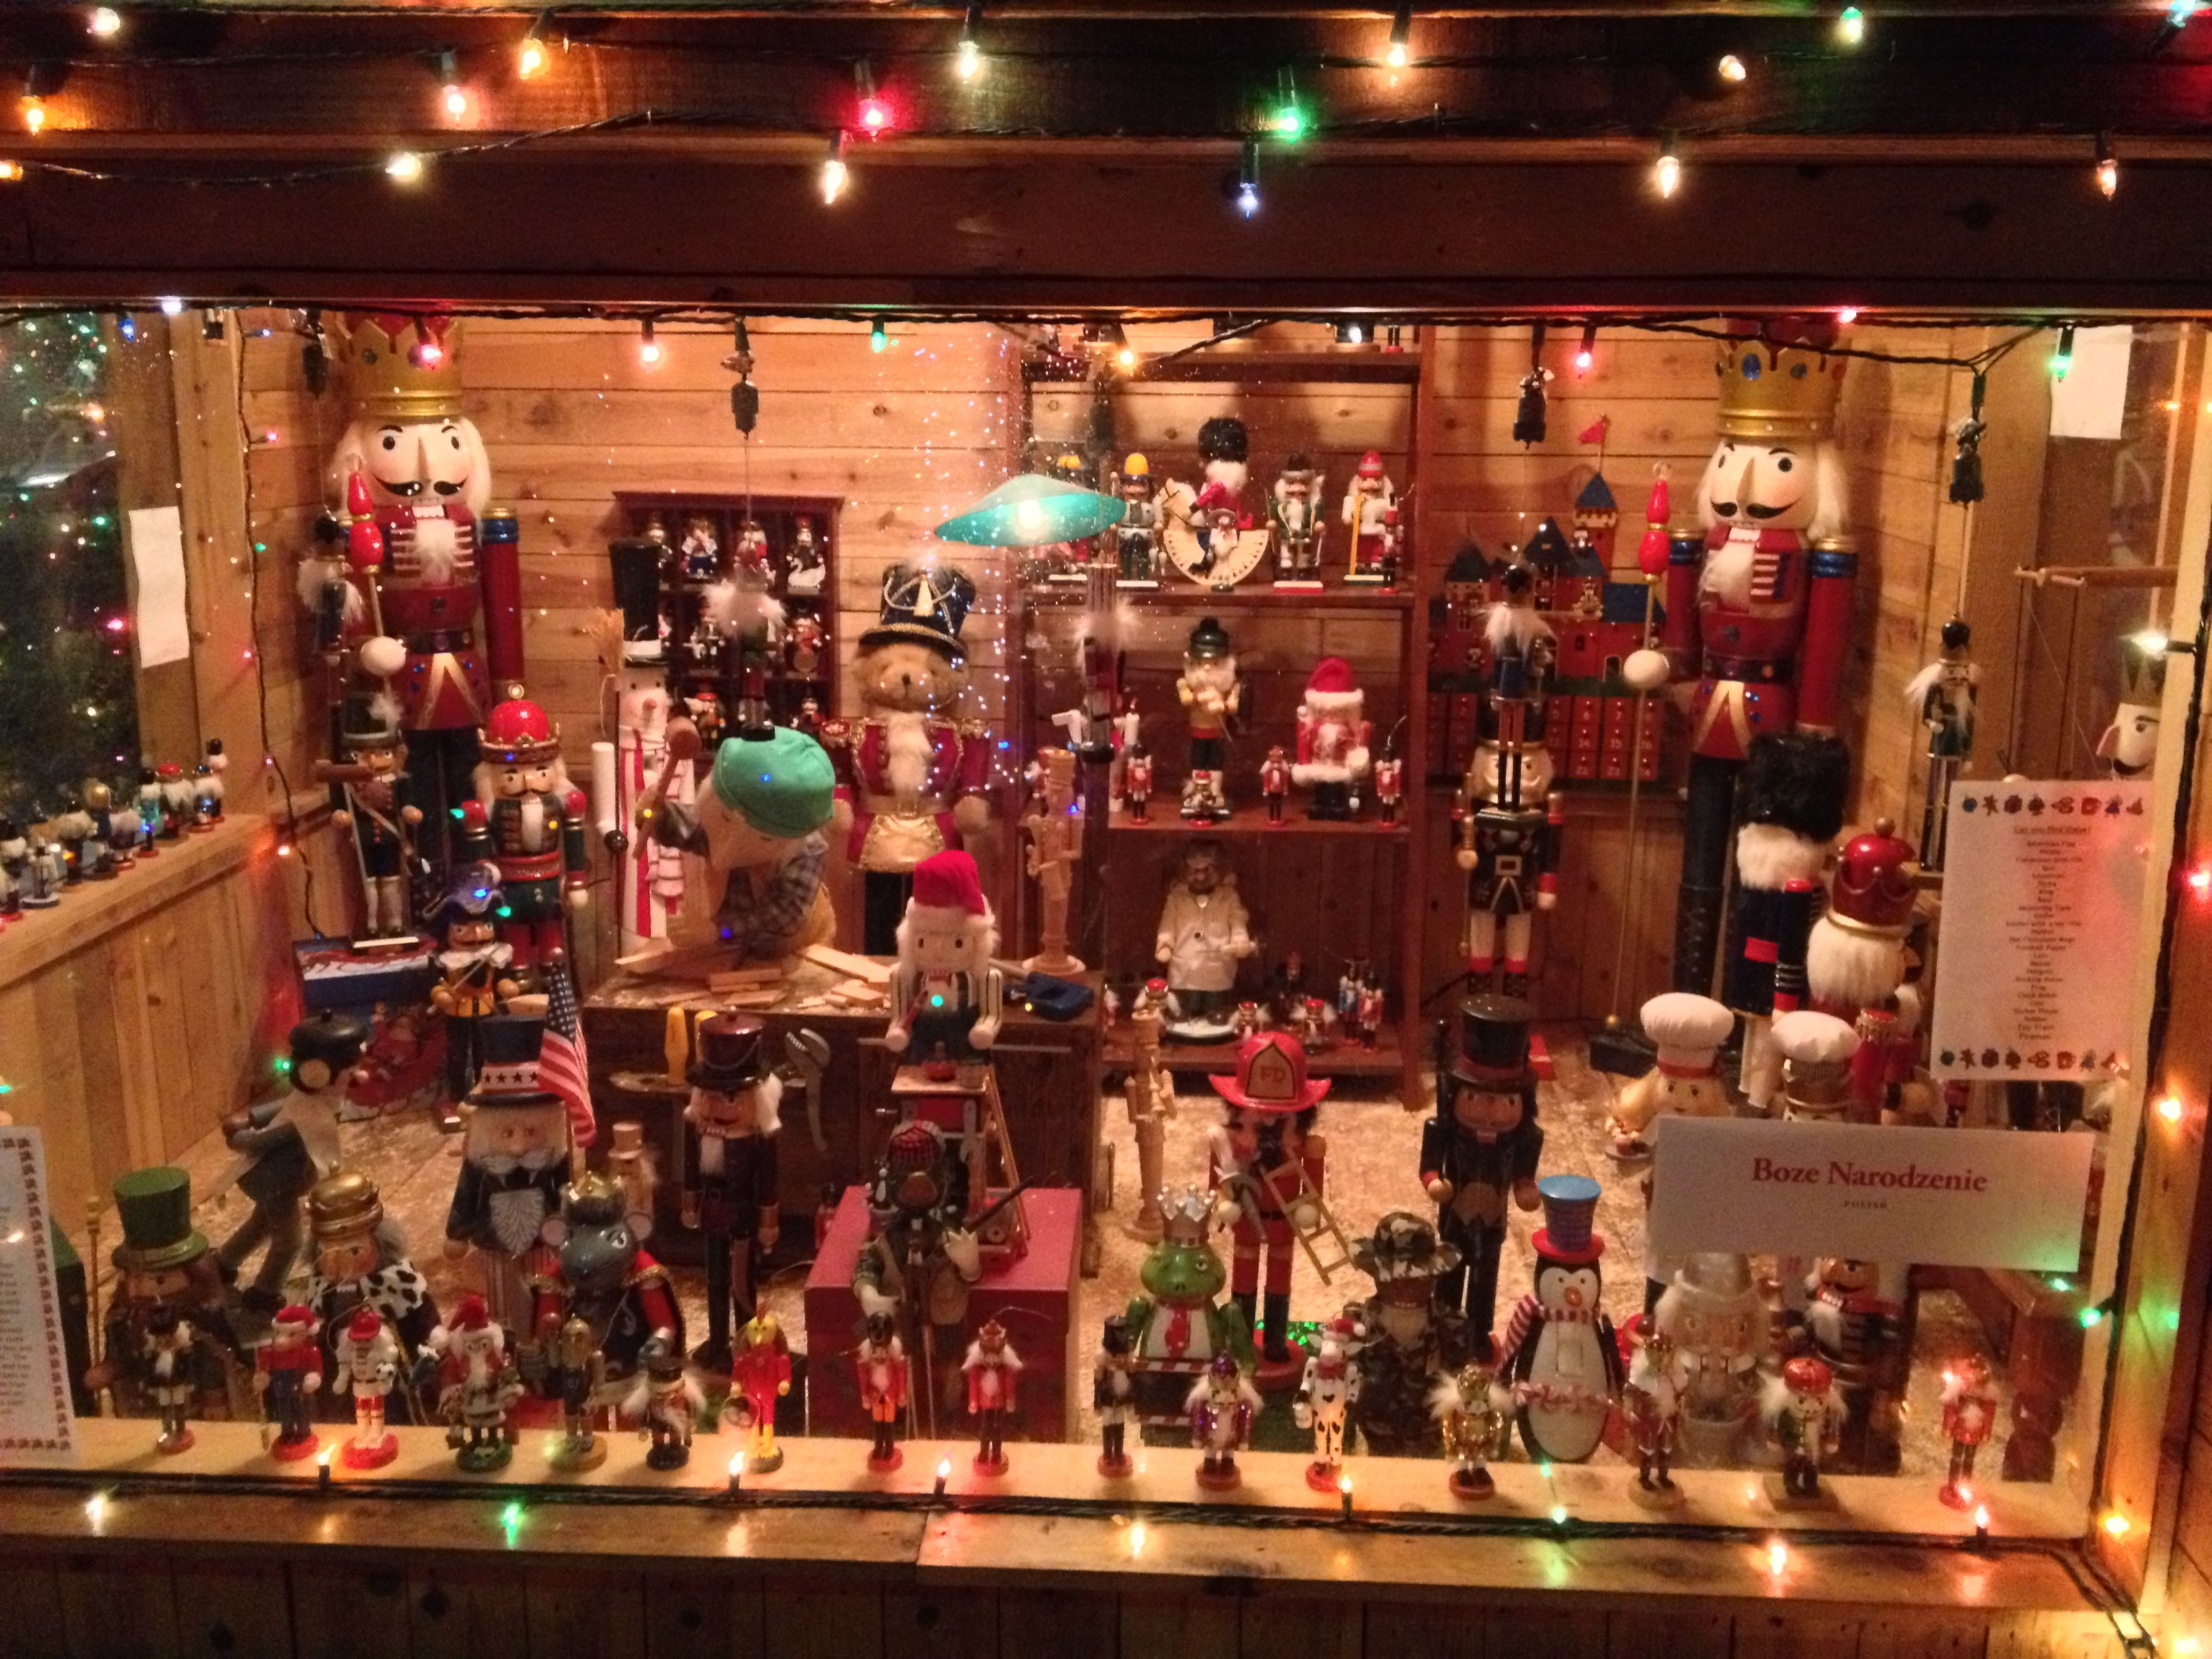 Christmas Village, Ogden, UT | Christmas Village Ogden | Pinterest ...